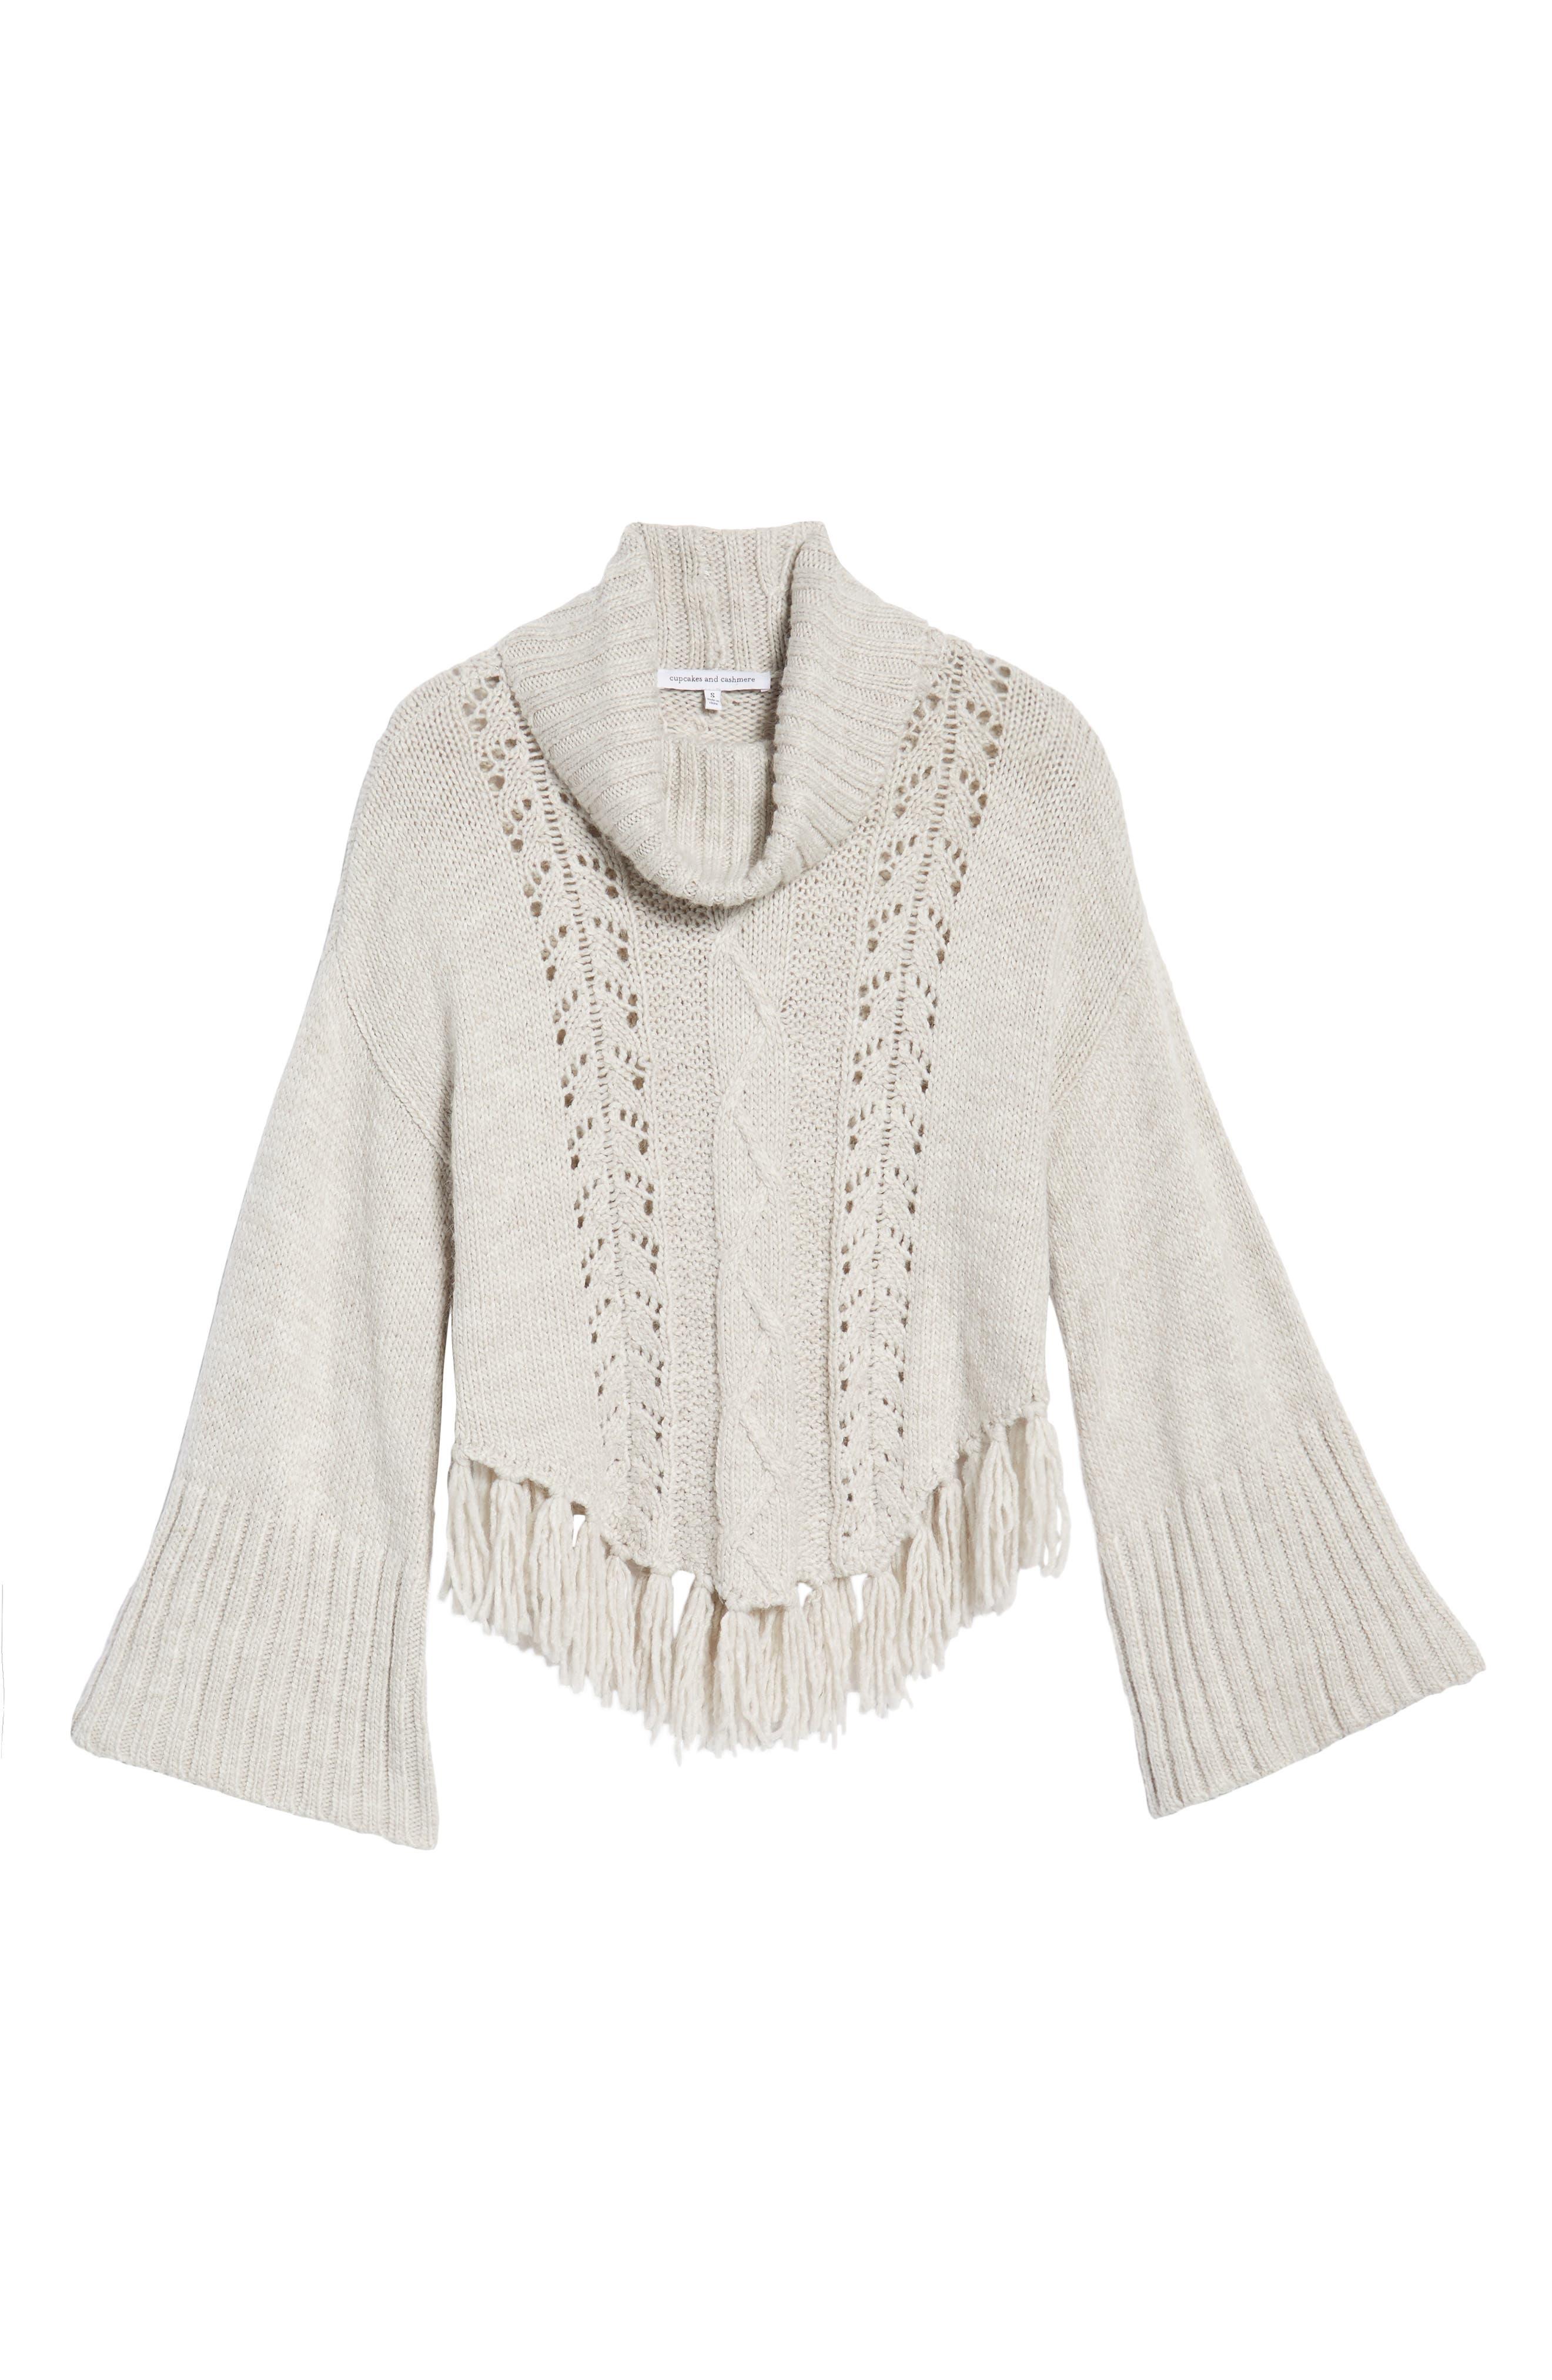 Prilla Fringe Cowl Neck Sweater,                             Alternate thumbnail 6, color,                             Latte